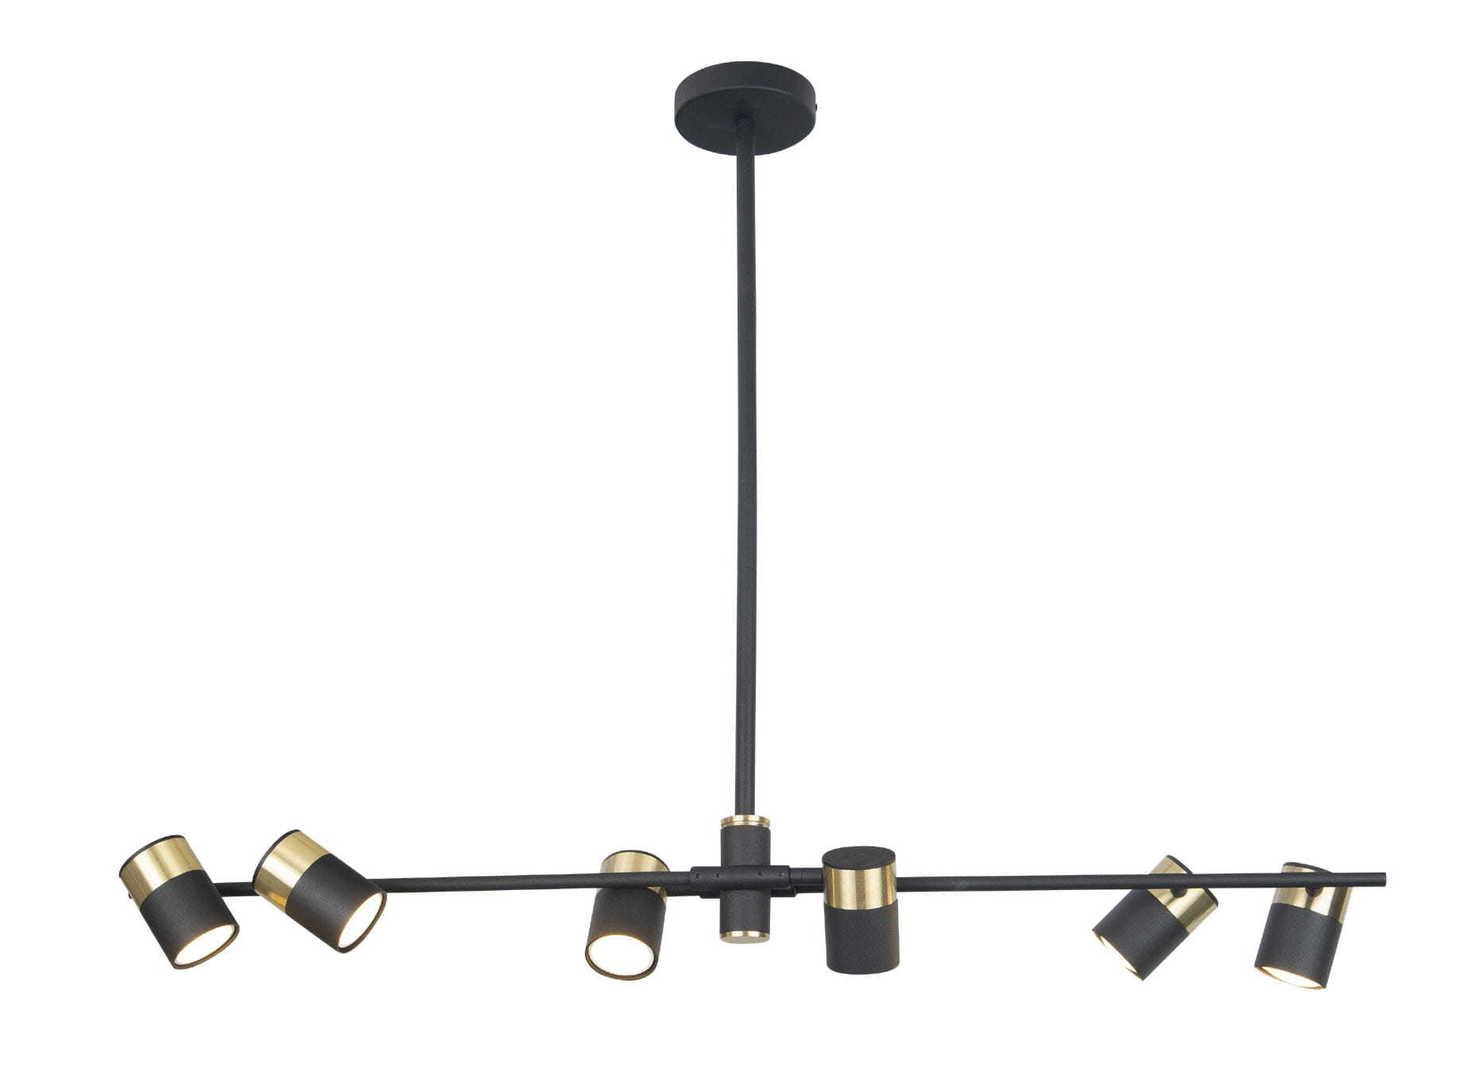 PUMA P0409 HANGING LAMP Max Light